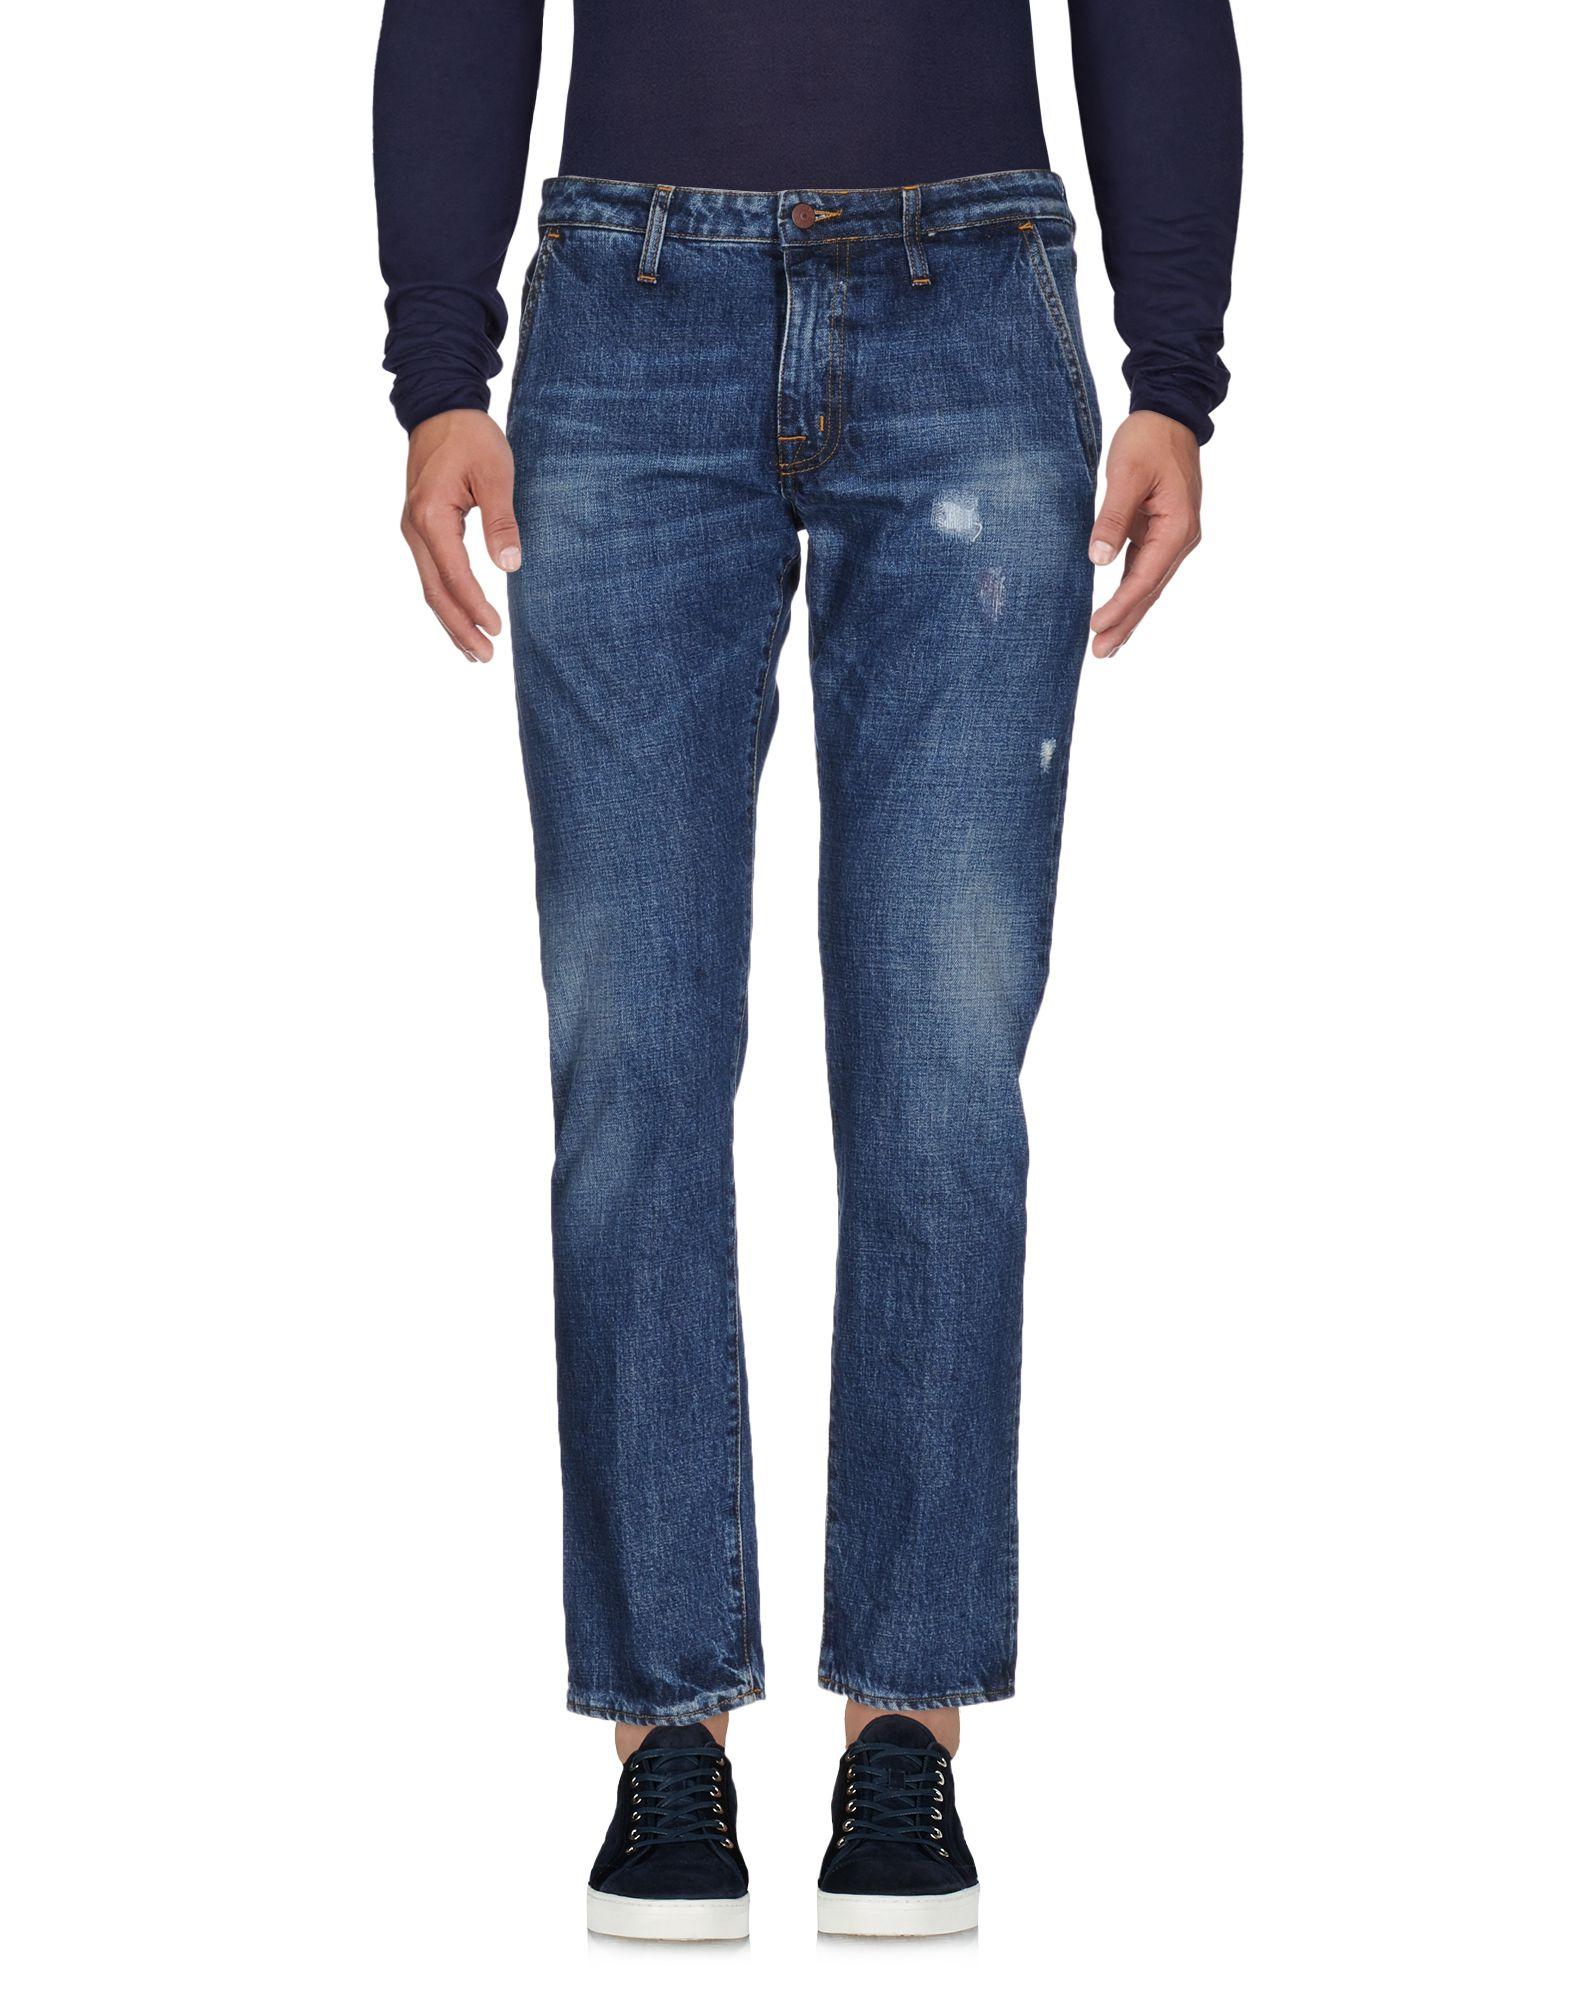 (+) PEOPLE Herren Jeanshose Farbe Blau Größe 8 - broschei